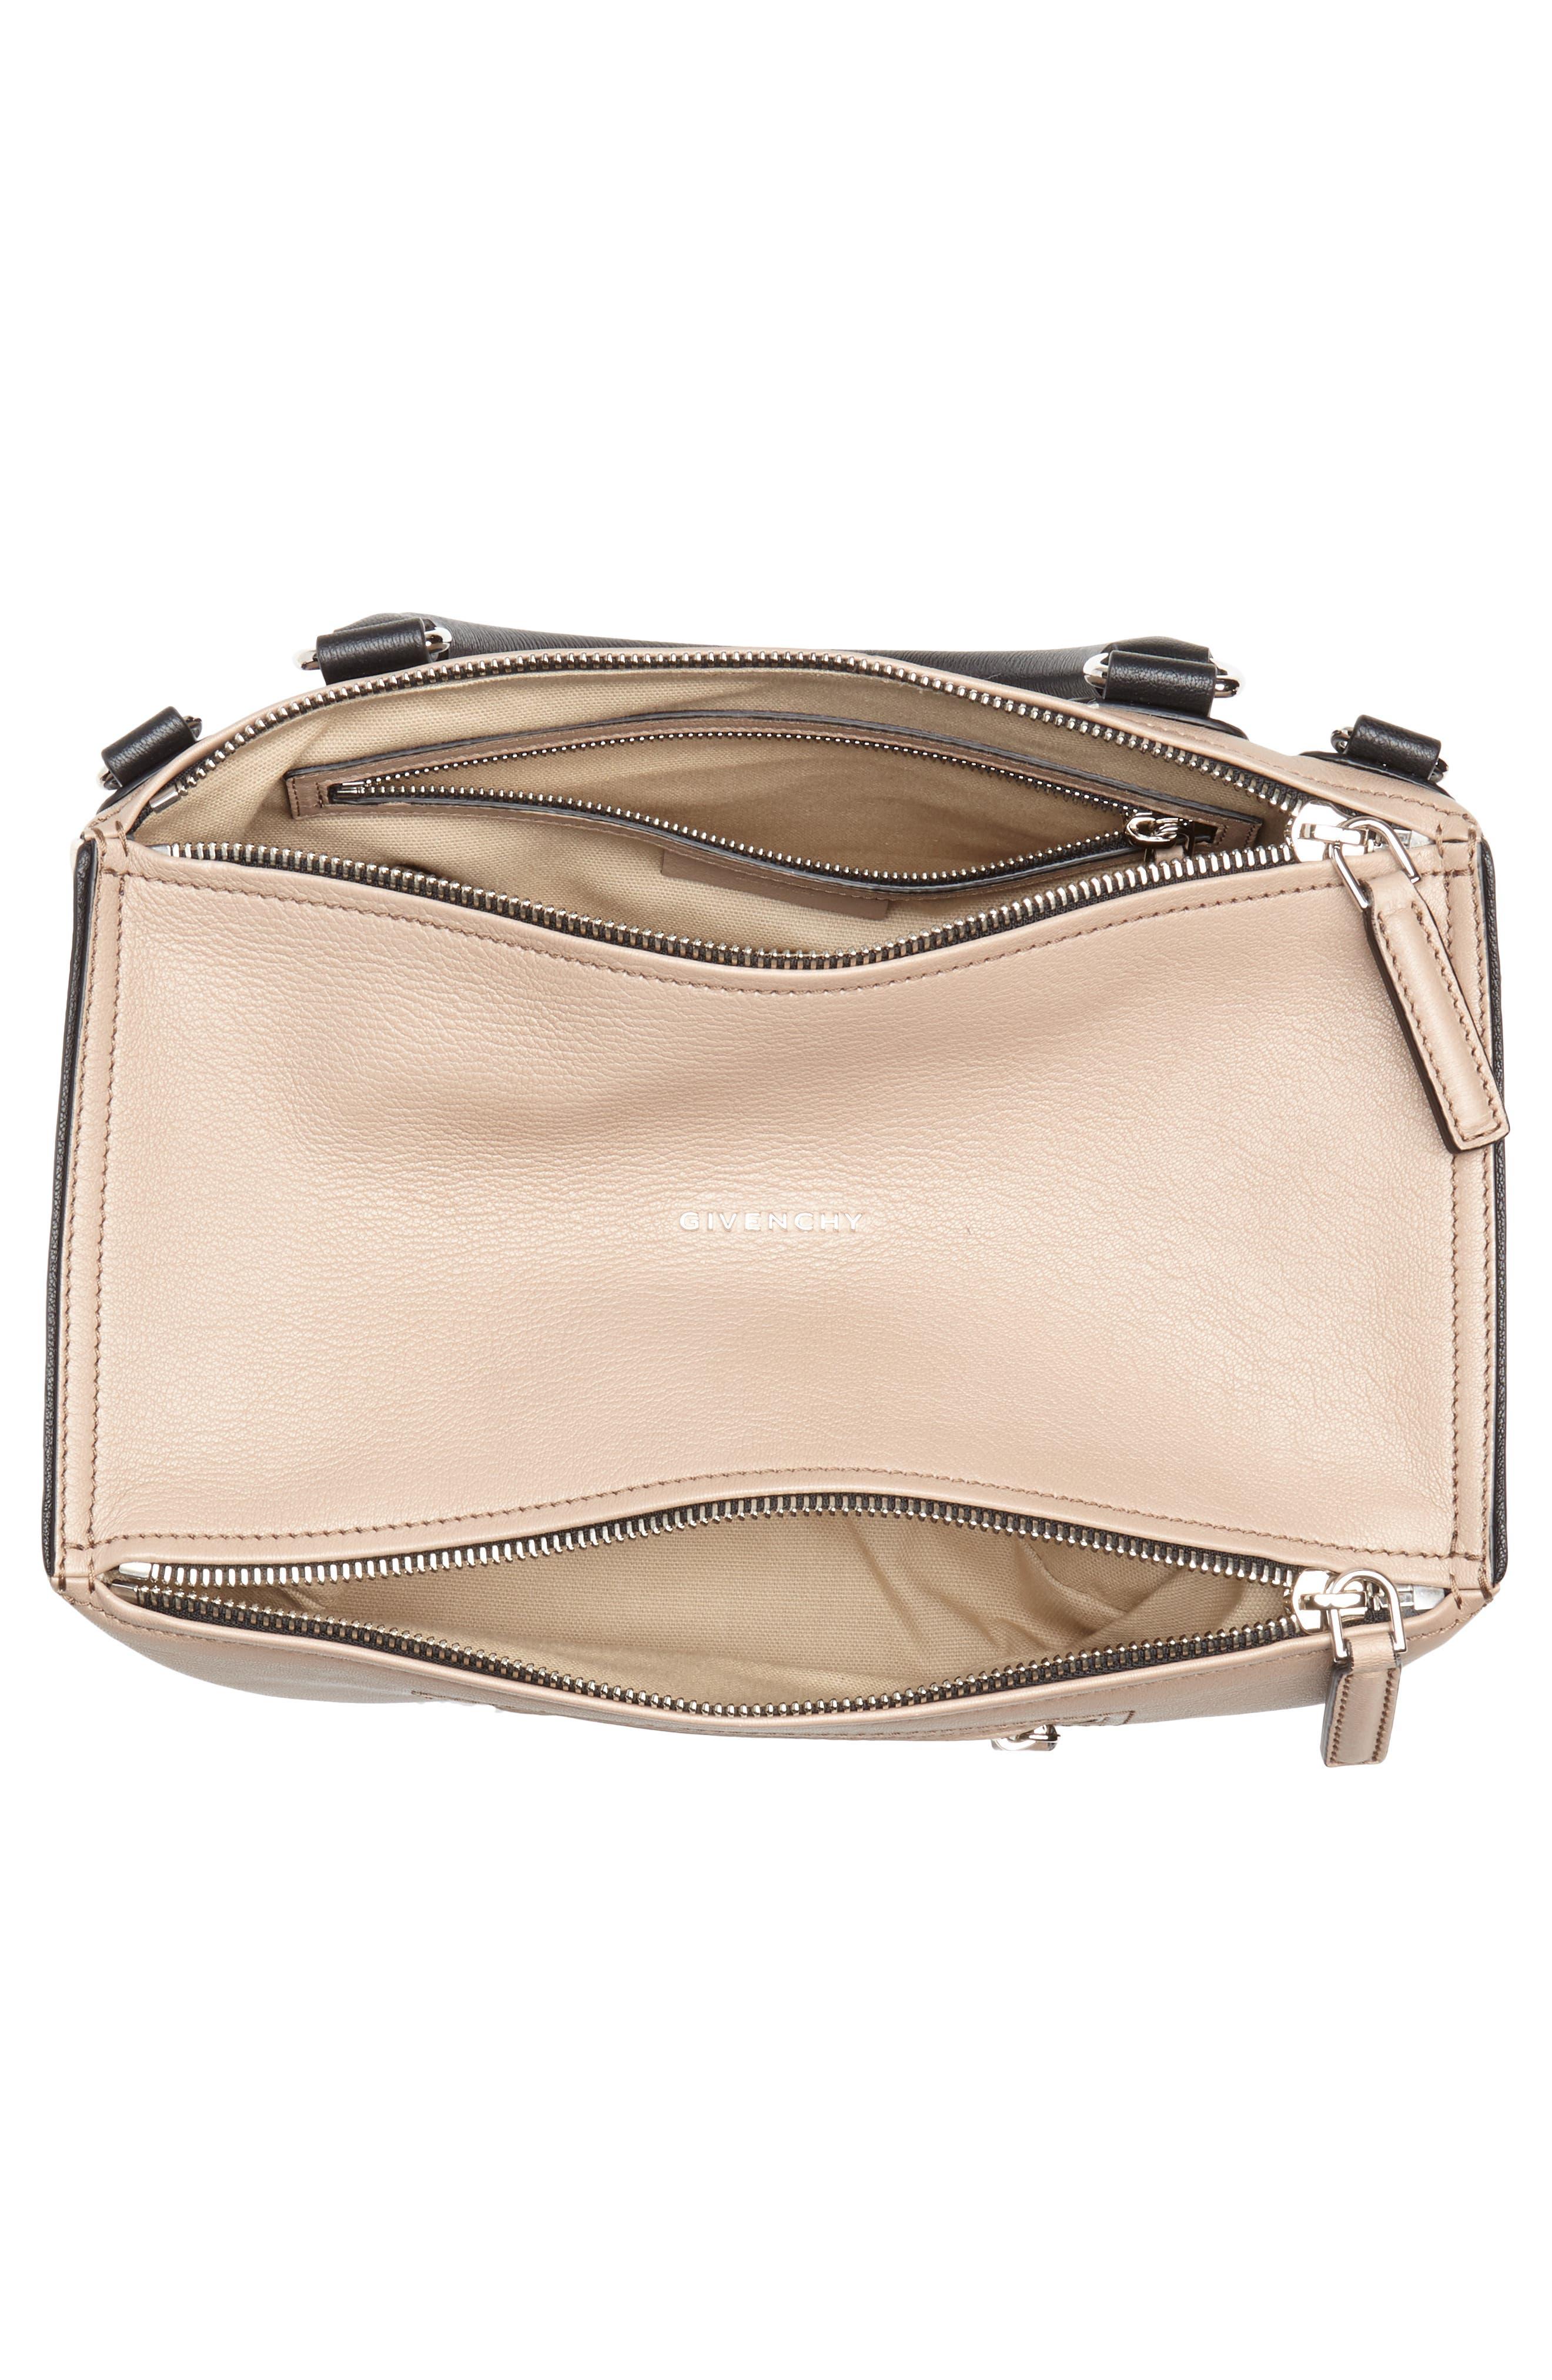 Medium Pandora Box Tricolor Leather Crossbody Bag,                             Alternate thumbnail 4, color,                             250